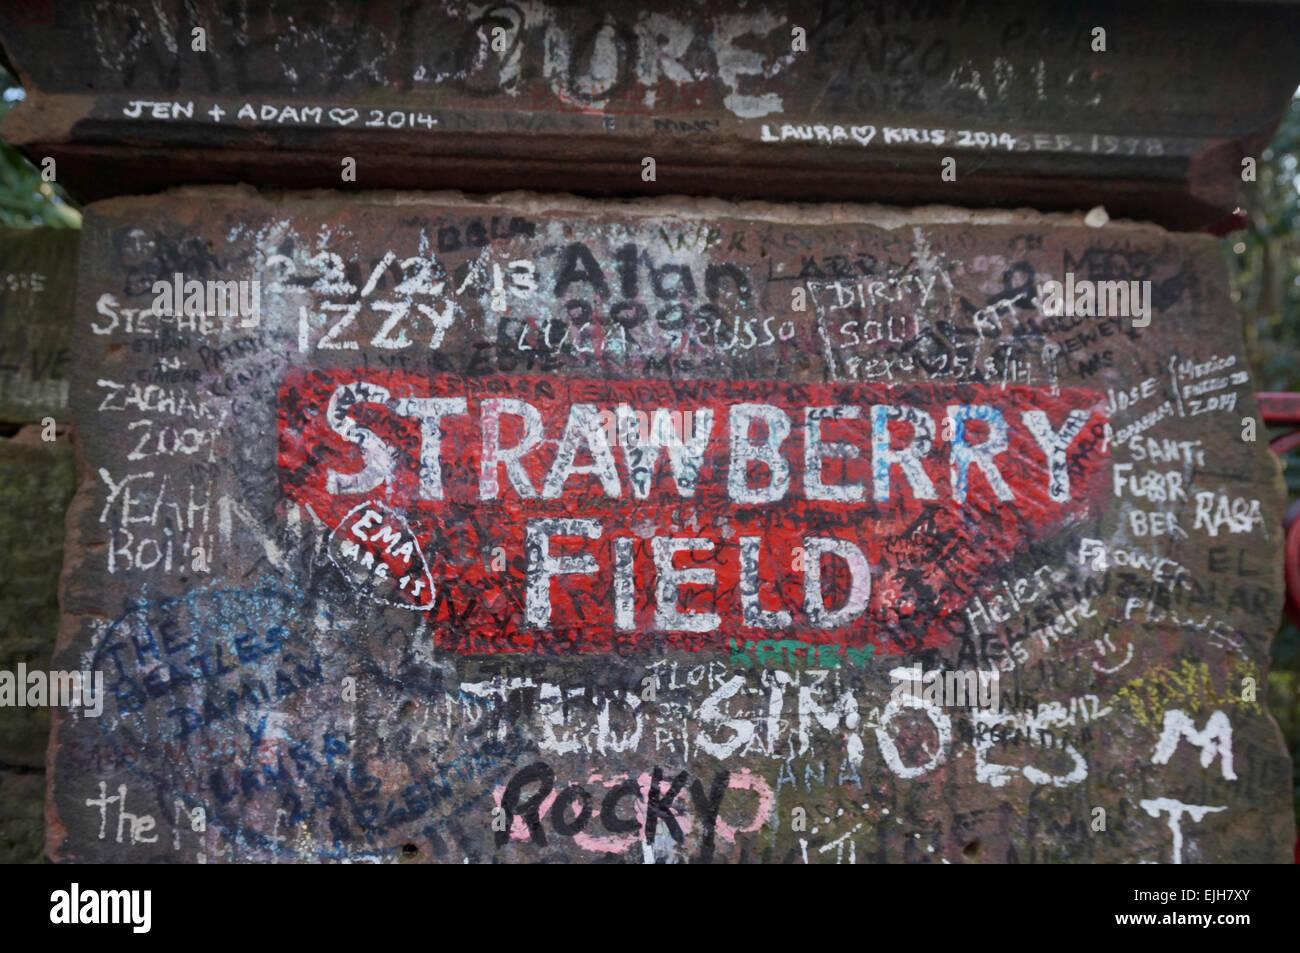 Strawberry Field Written On Gatepost - Stock Image